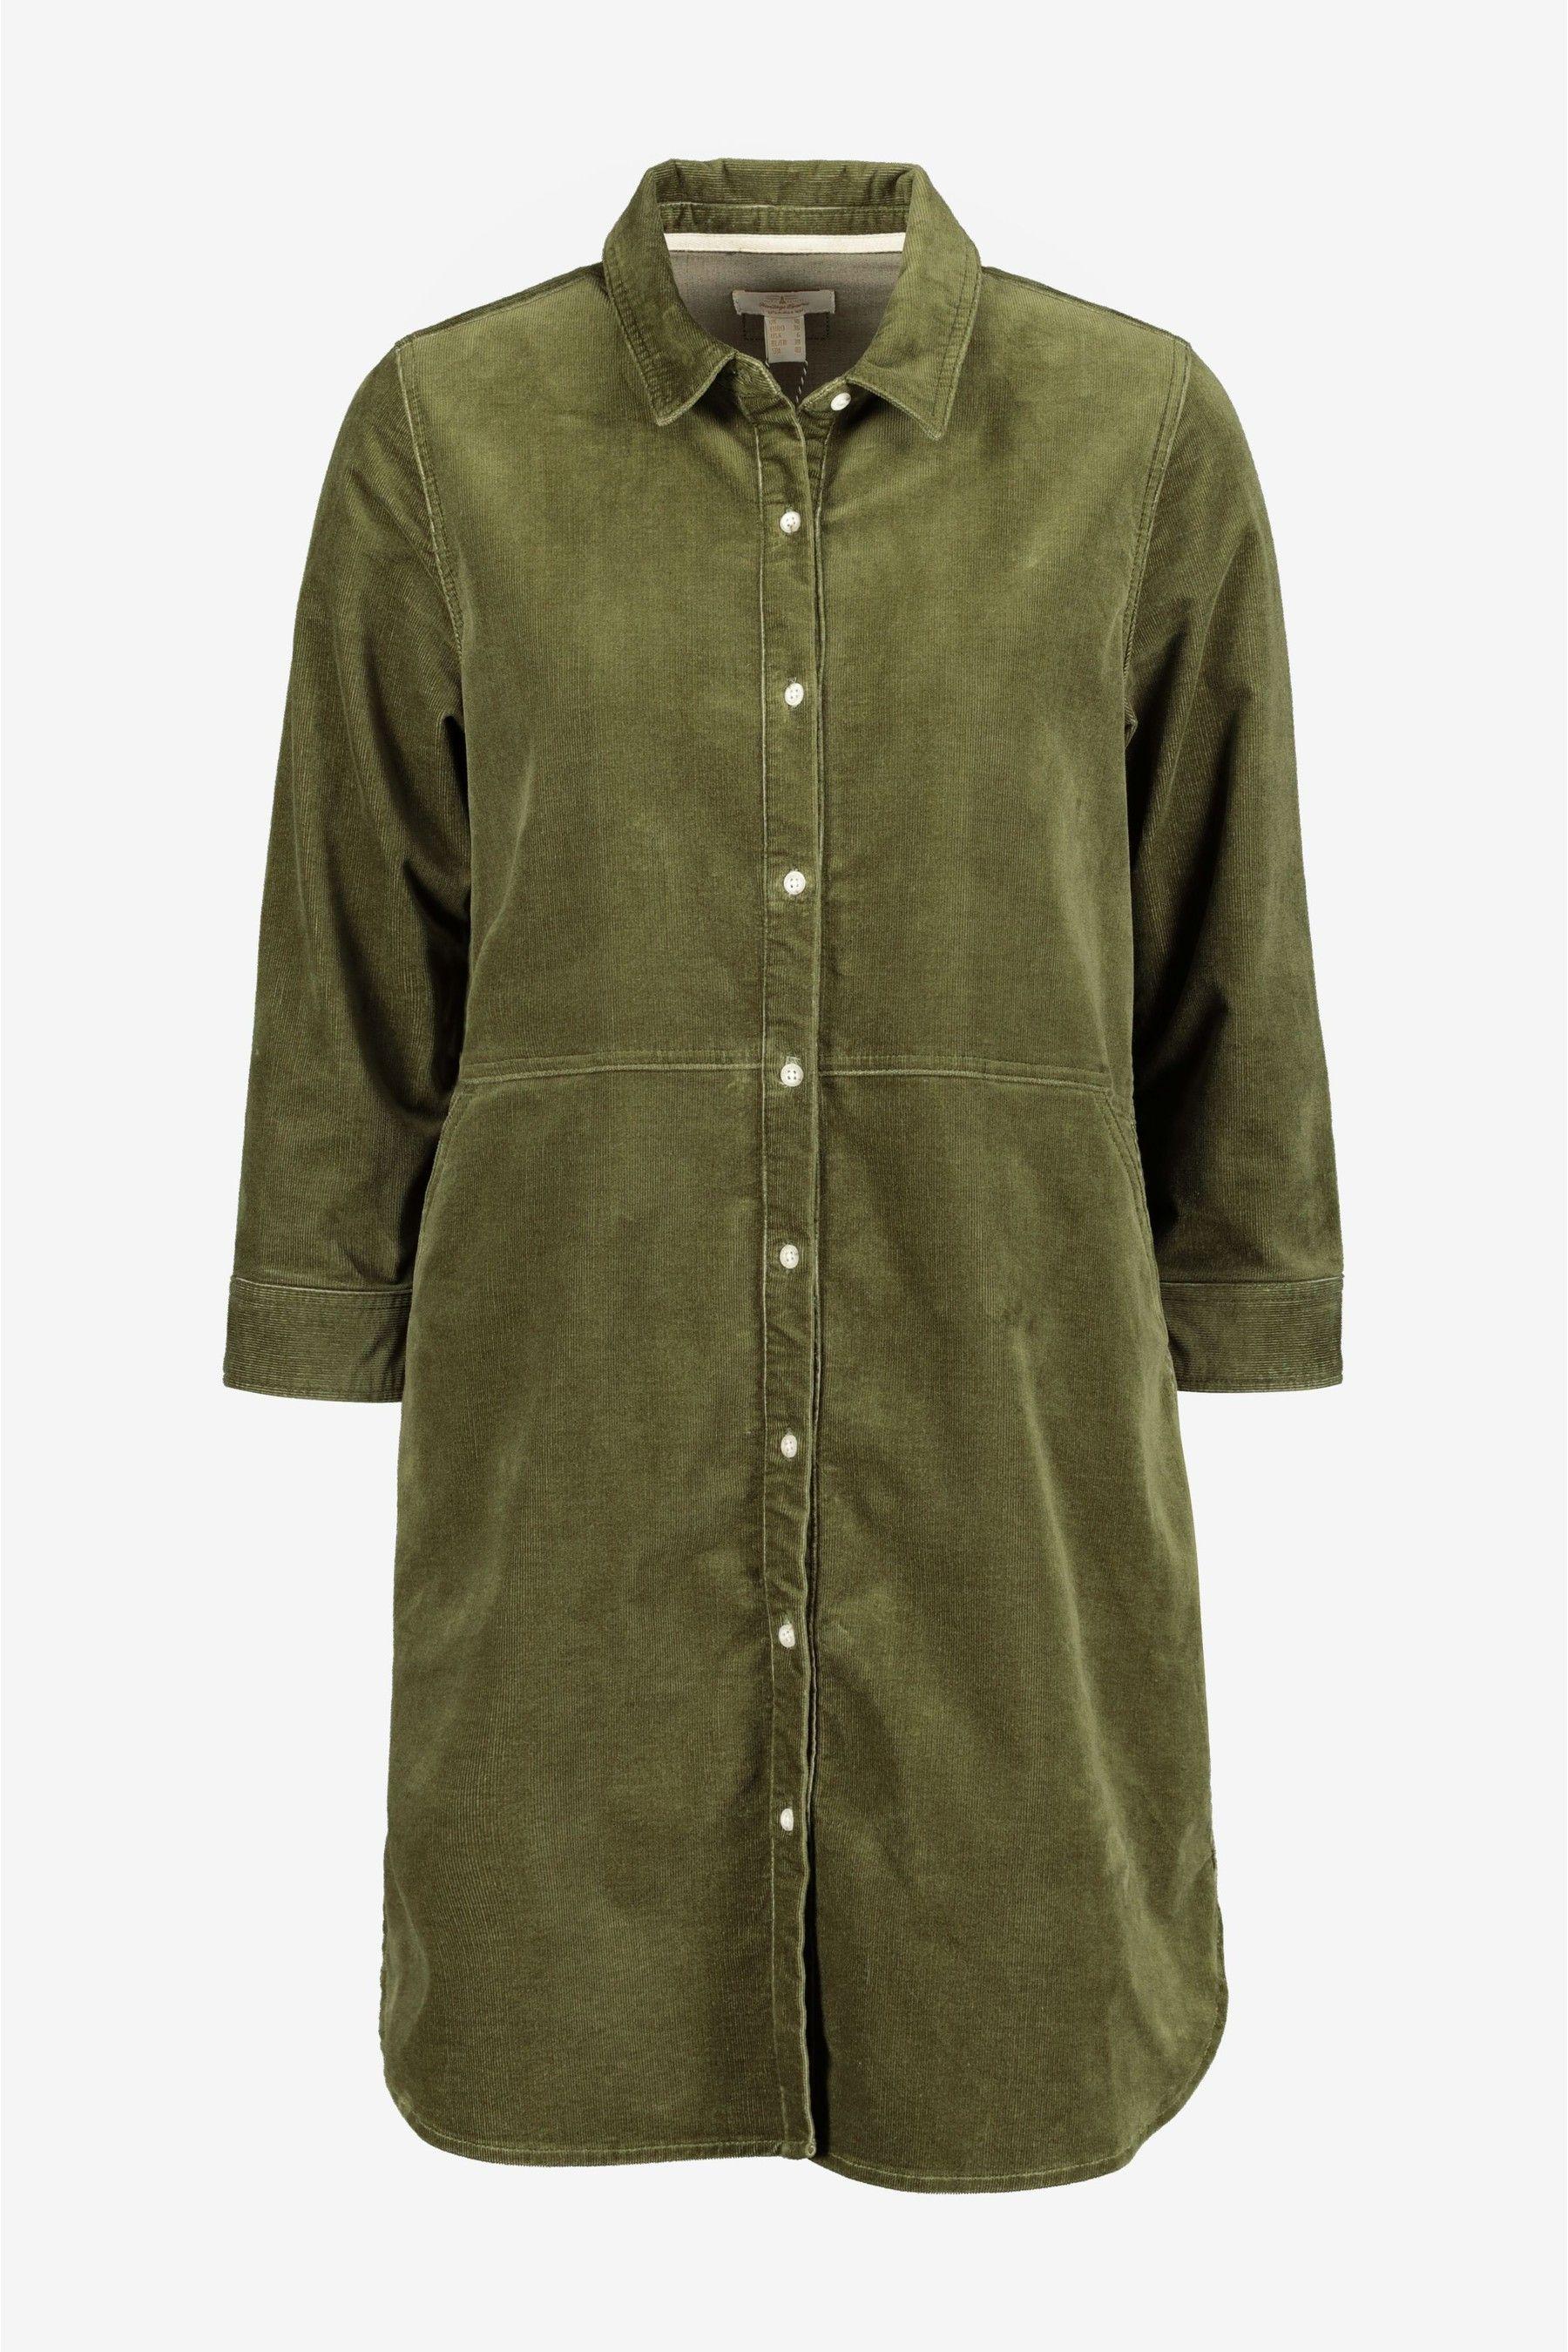 Womens Barbour Heritage Sage Green Corduroy Shirt Dress -  Green #sagegreendress